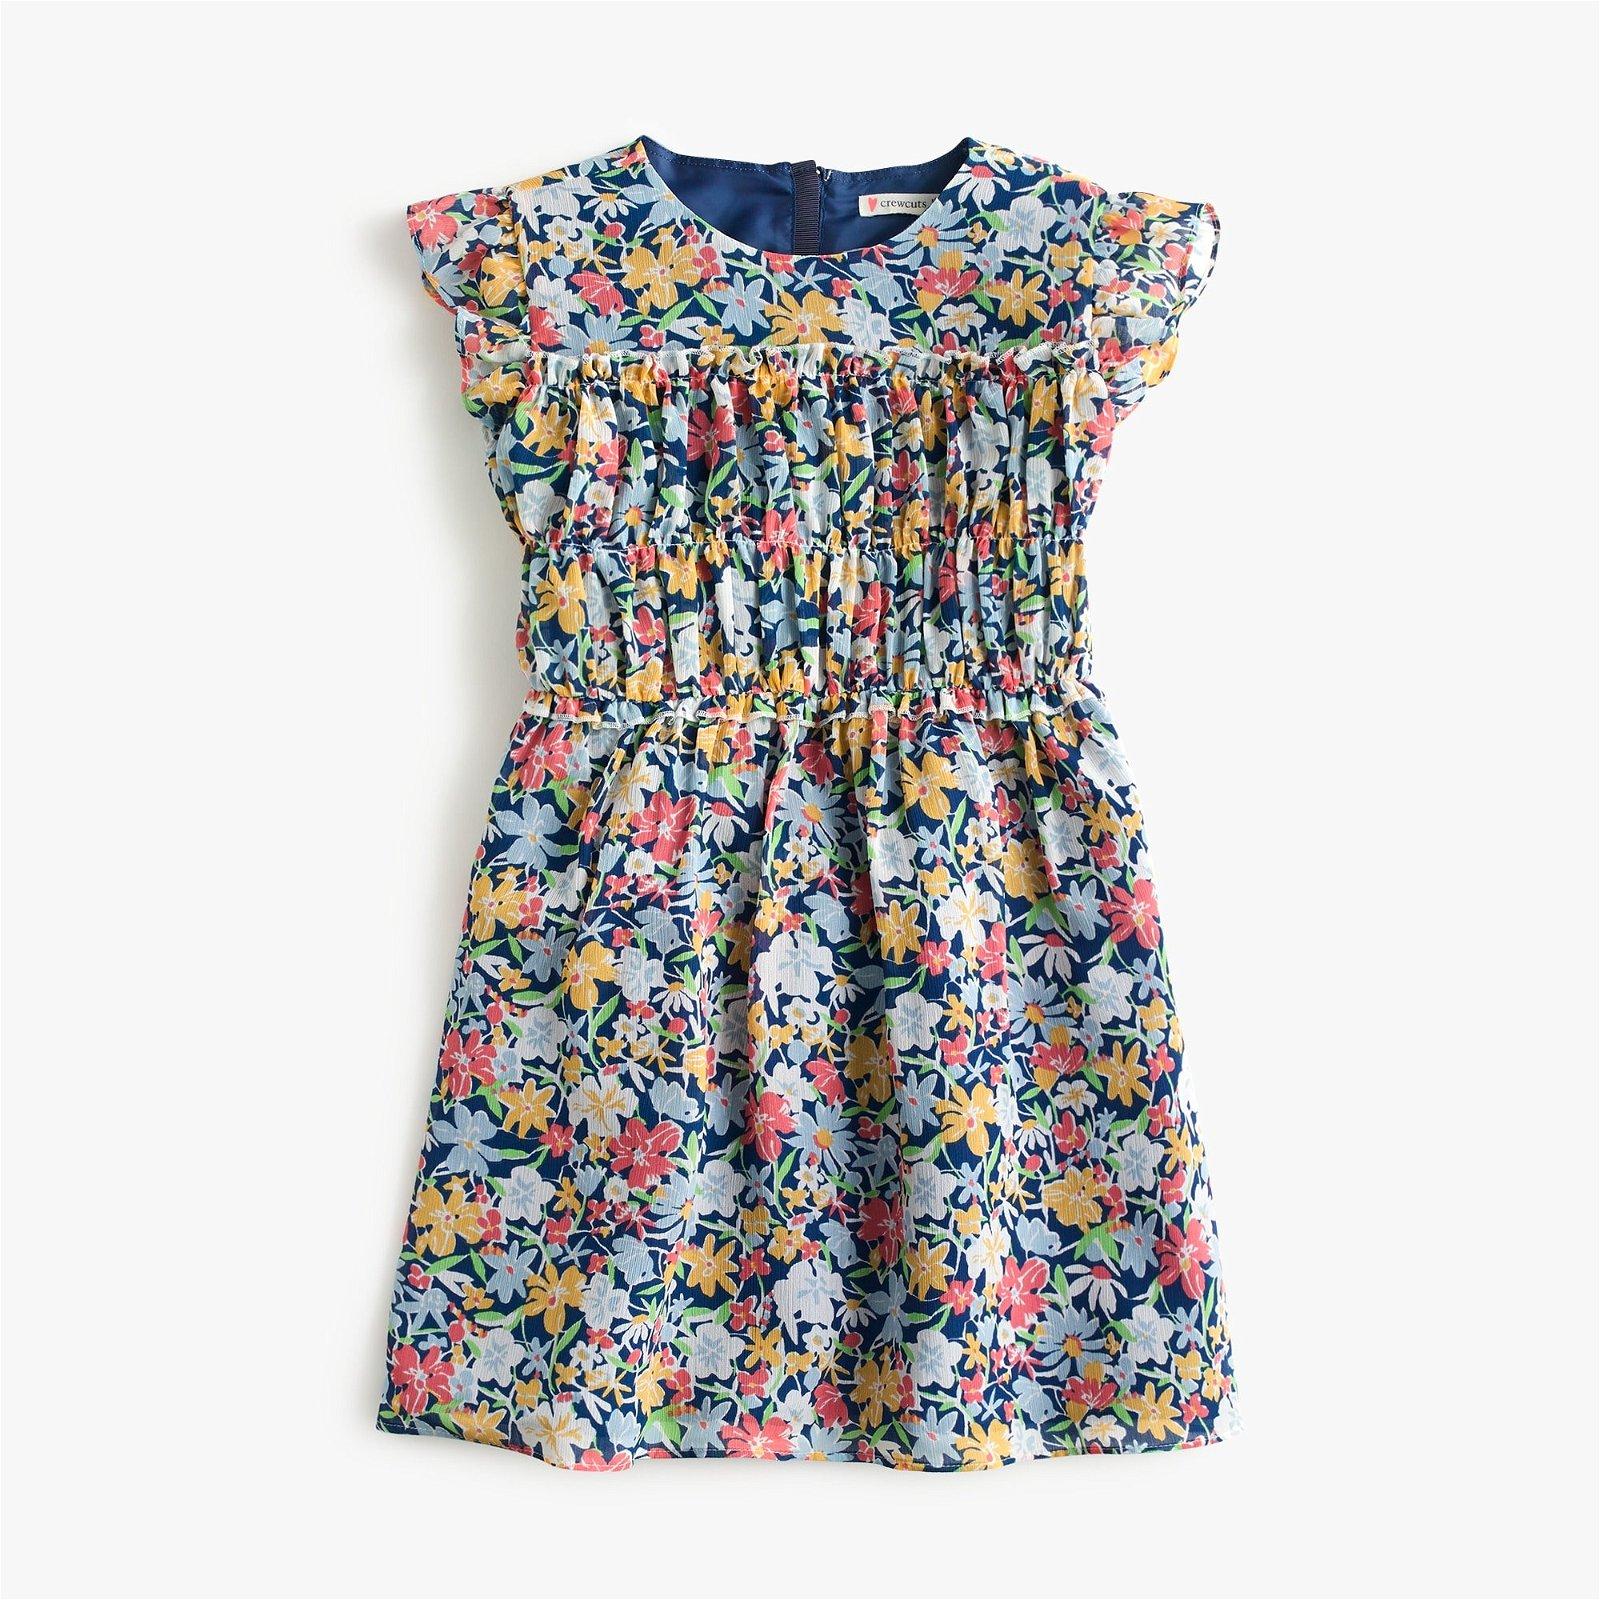 Girls' smocked-waist dress in blue floral